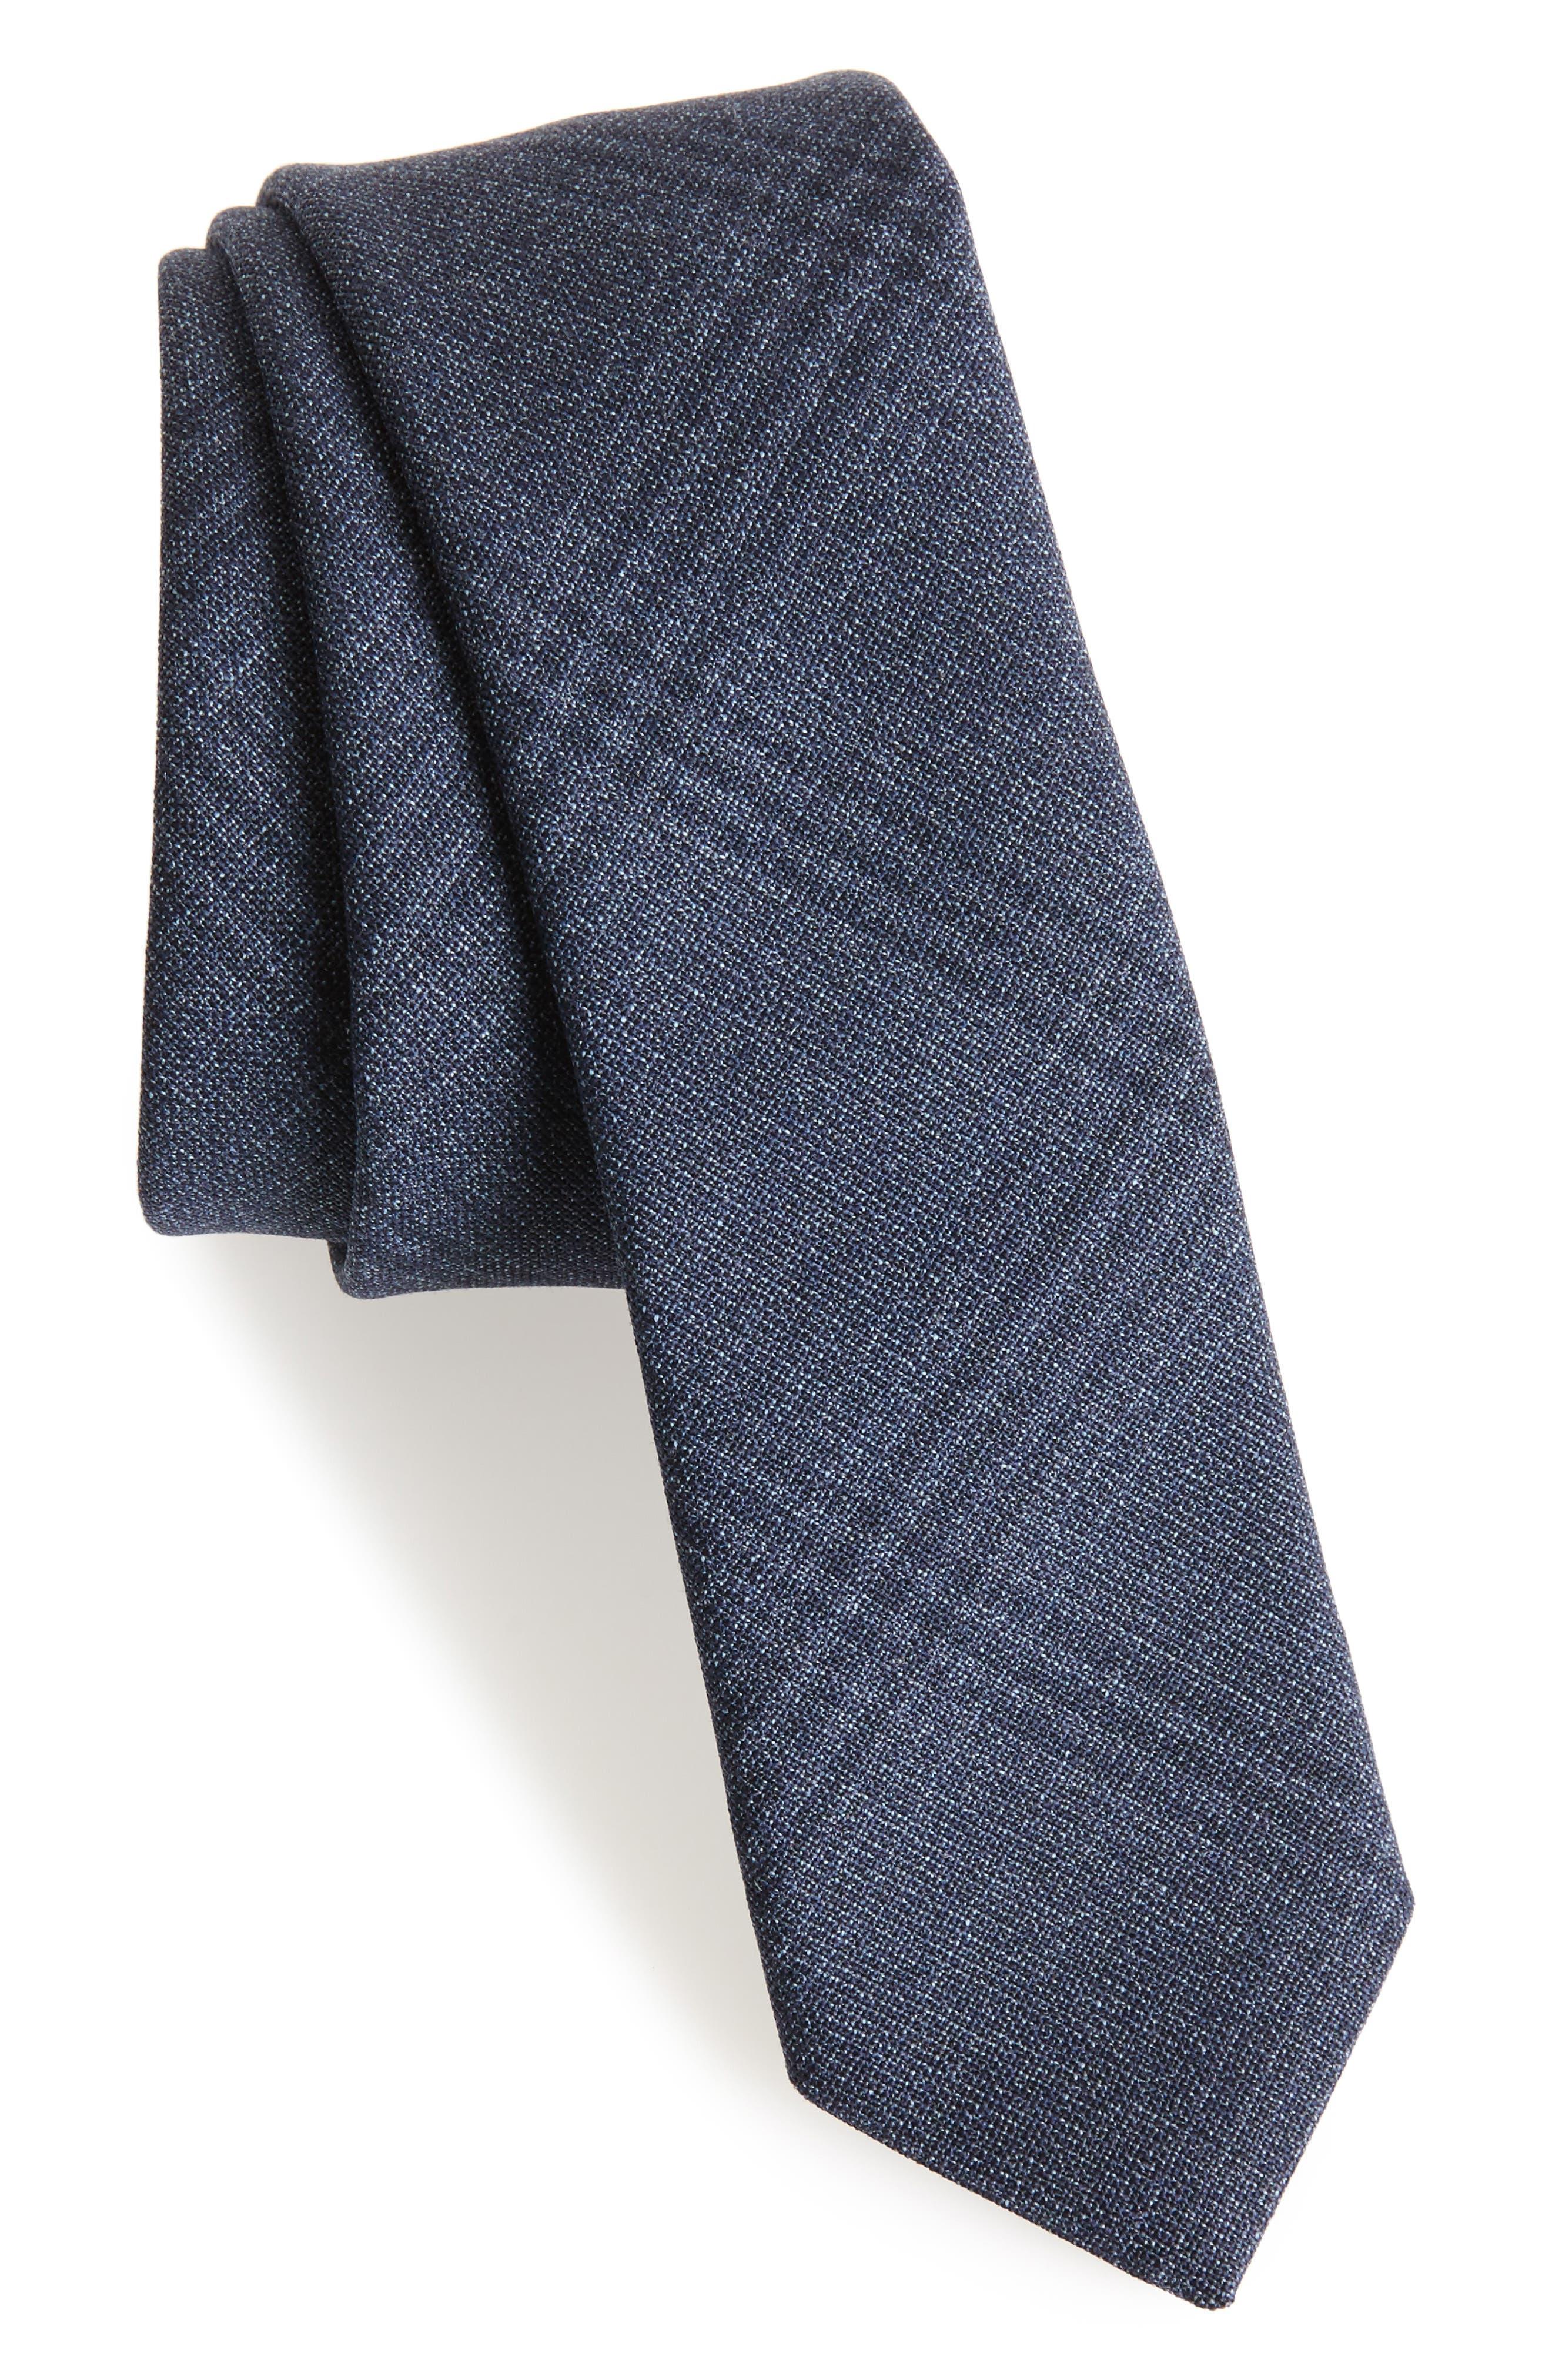 Plaid Wool Tie,                         Main,                         color, Grey